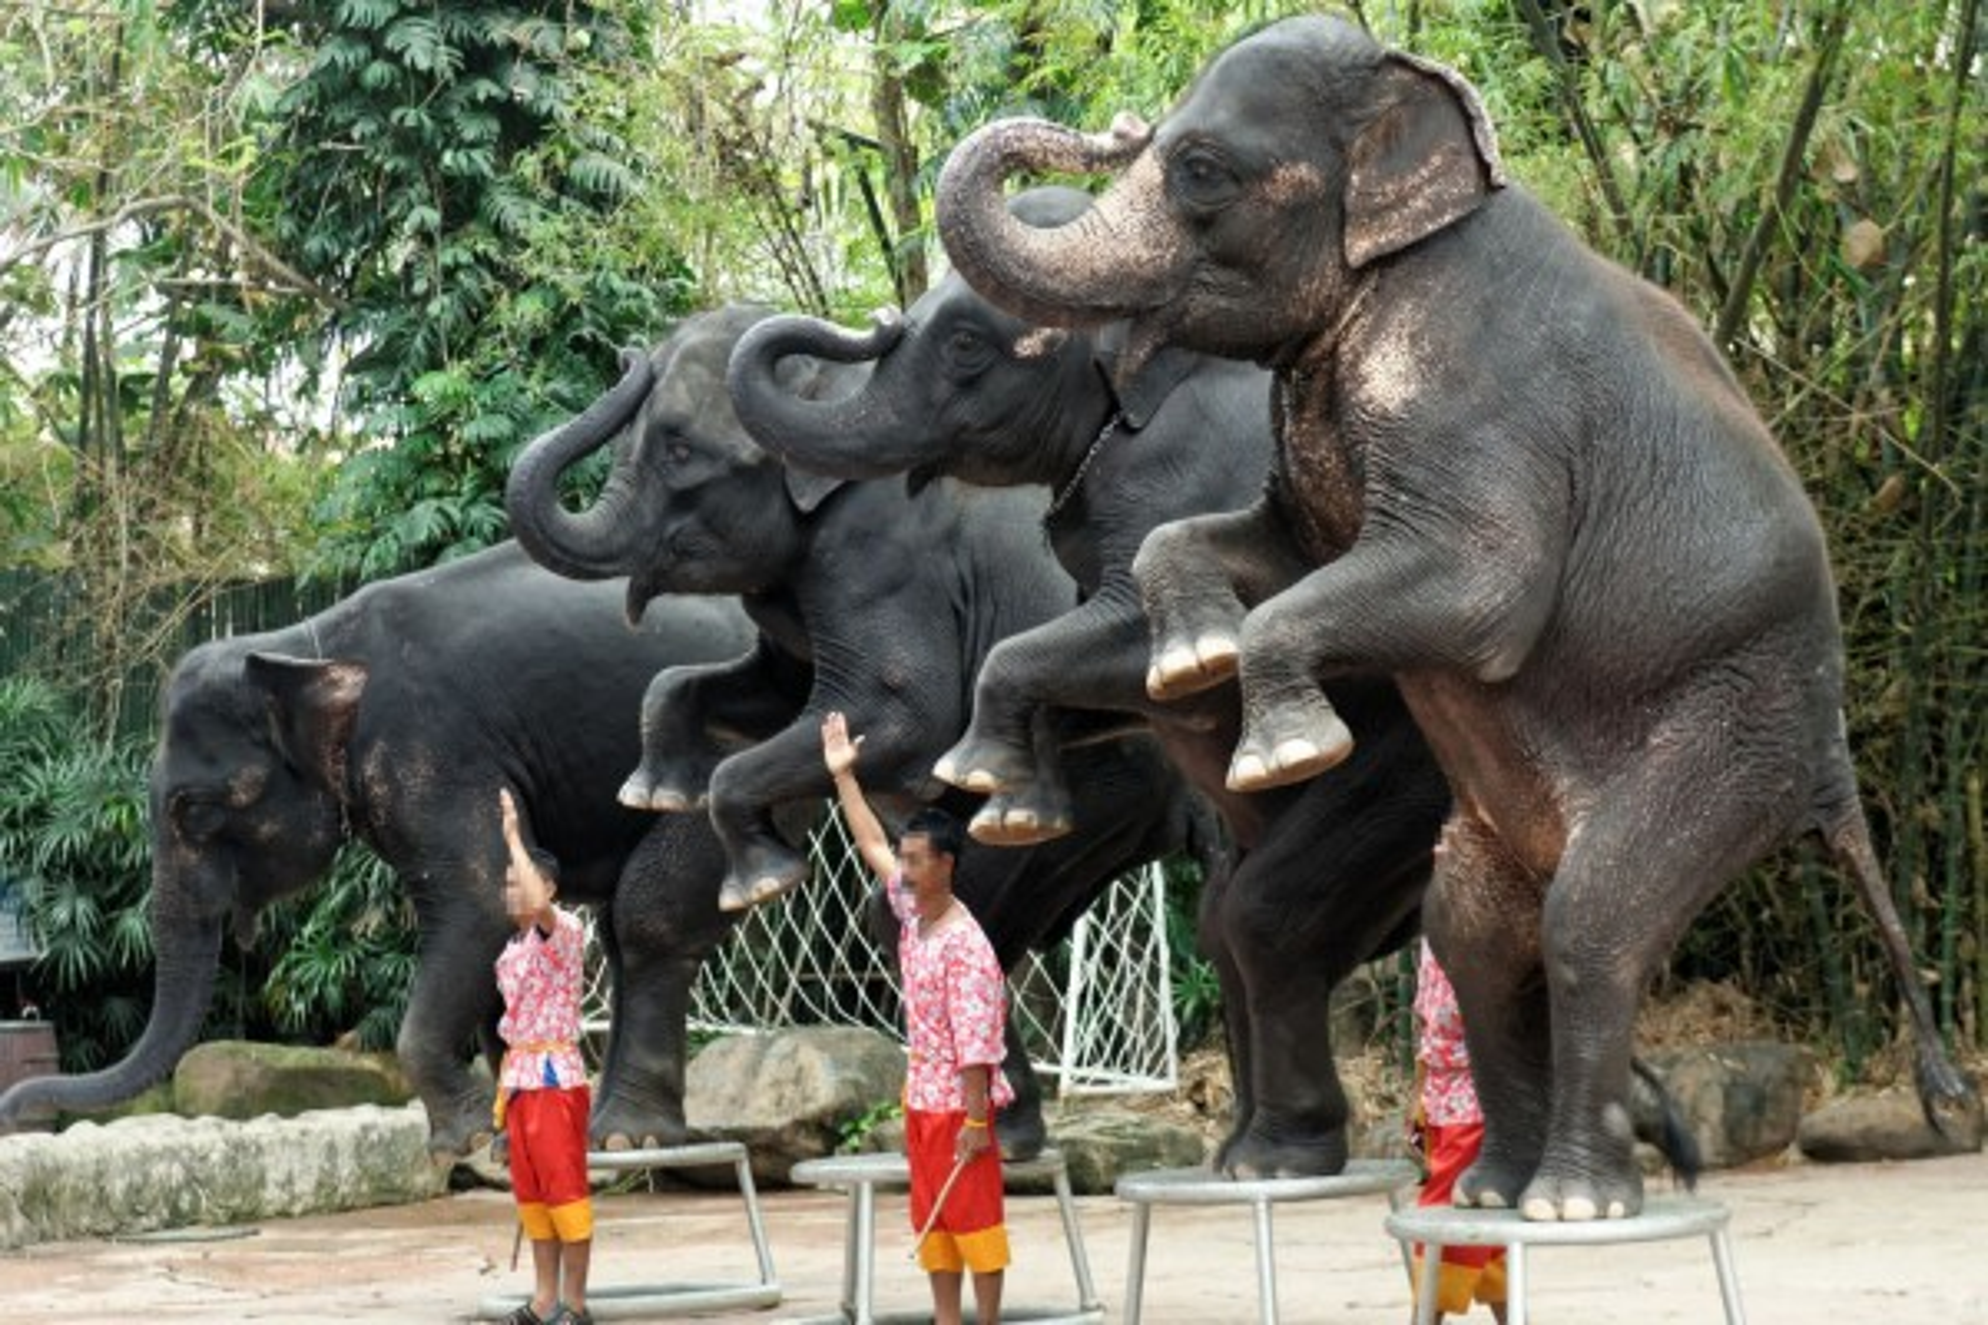 Elephants performing